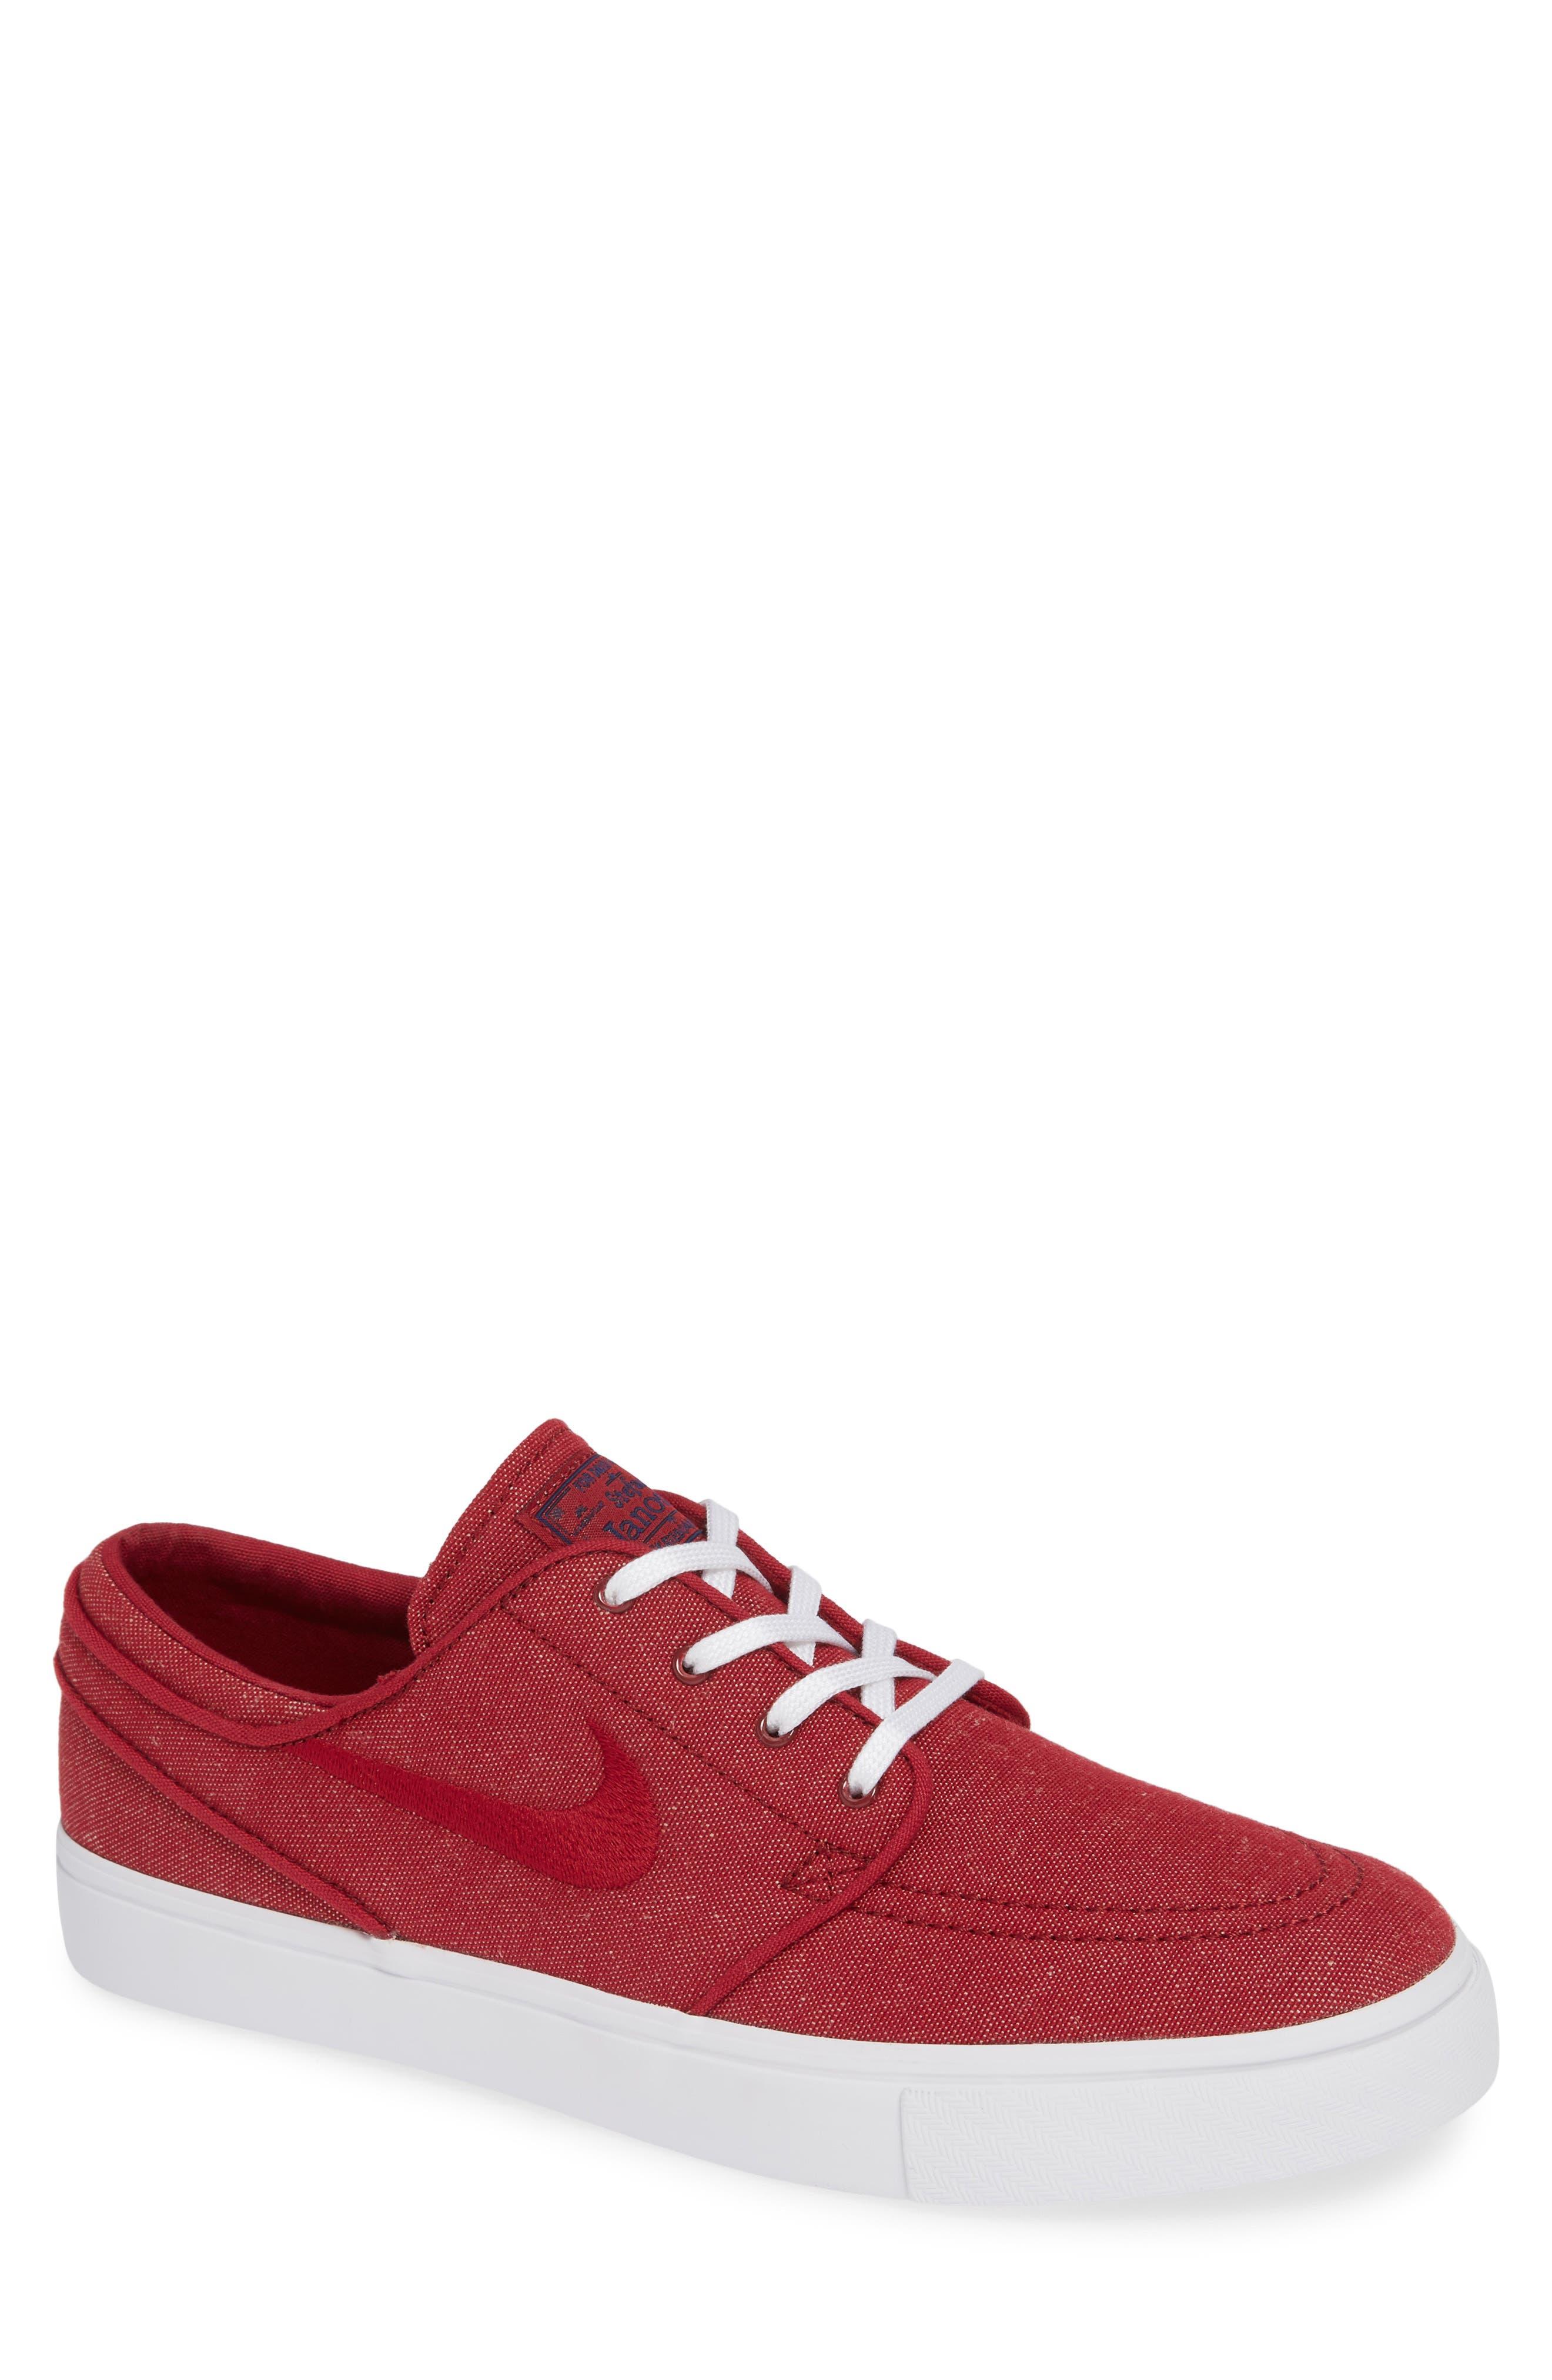 Zoom - Stefan Janoski SB Canvas Skate Shoe,                         Main,                         color, Red Crush/ White